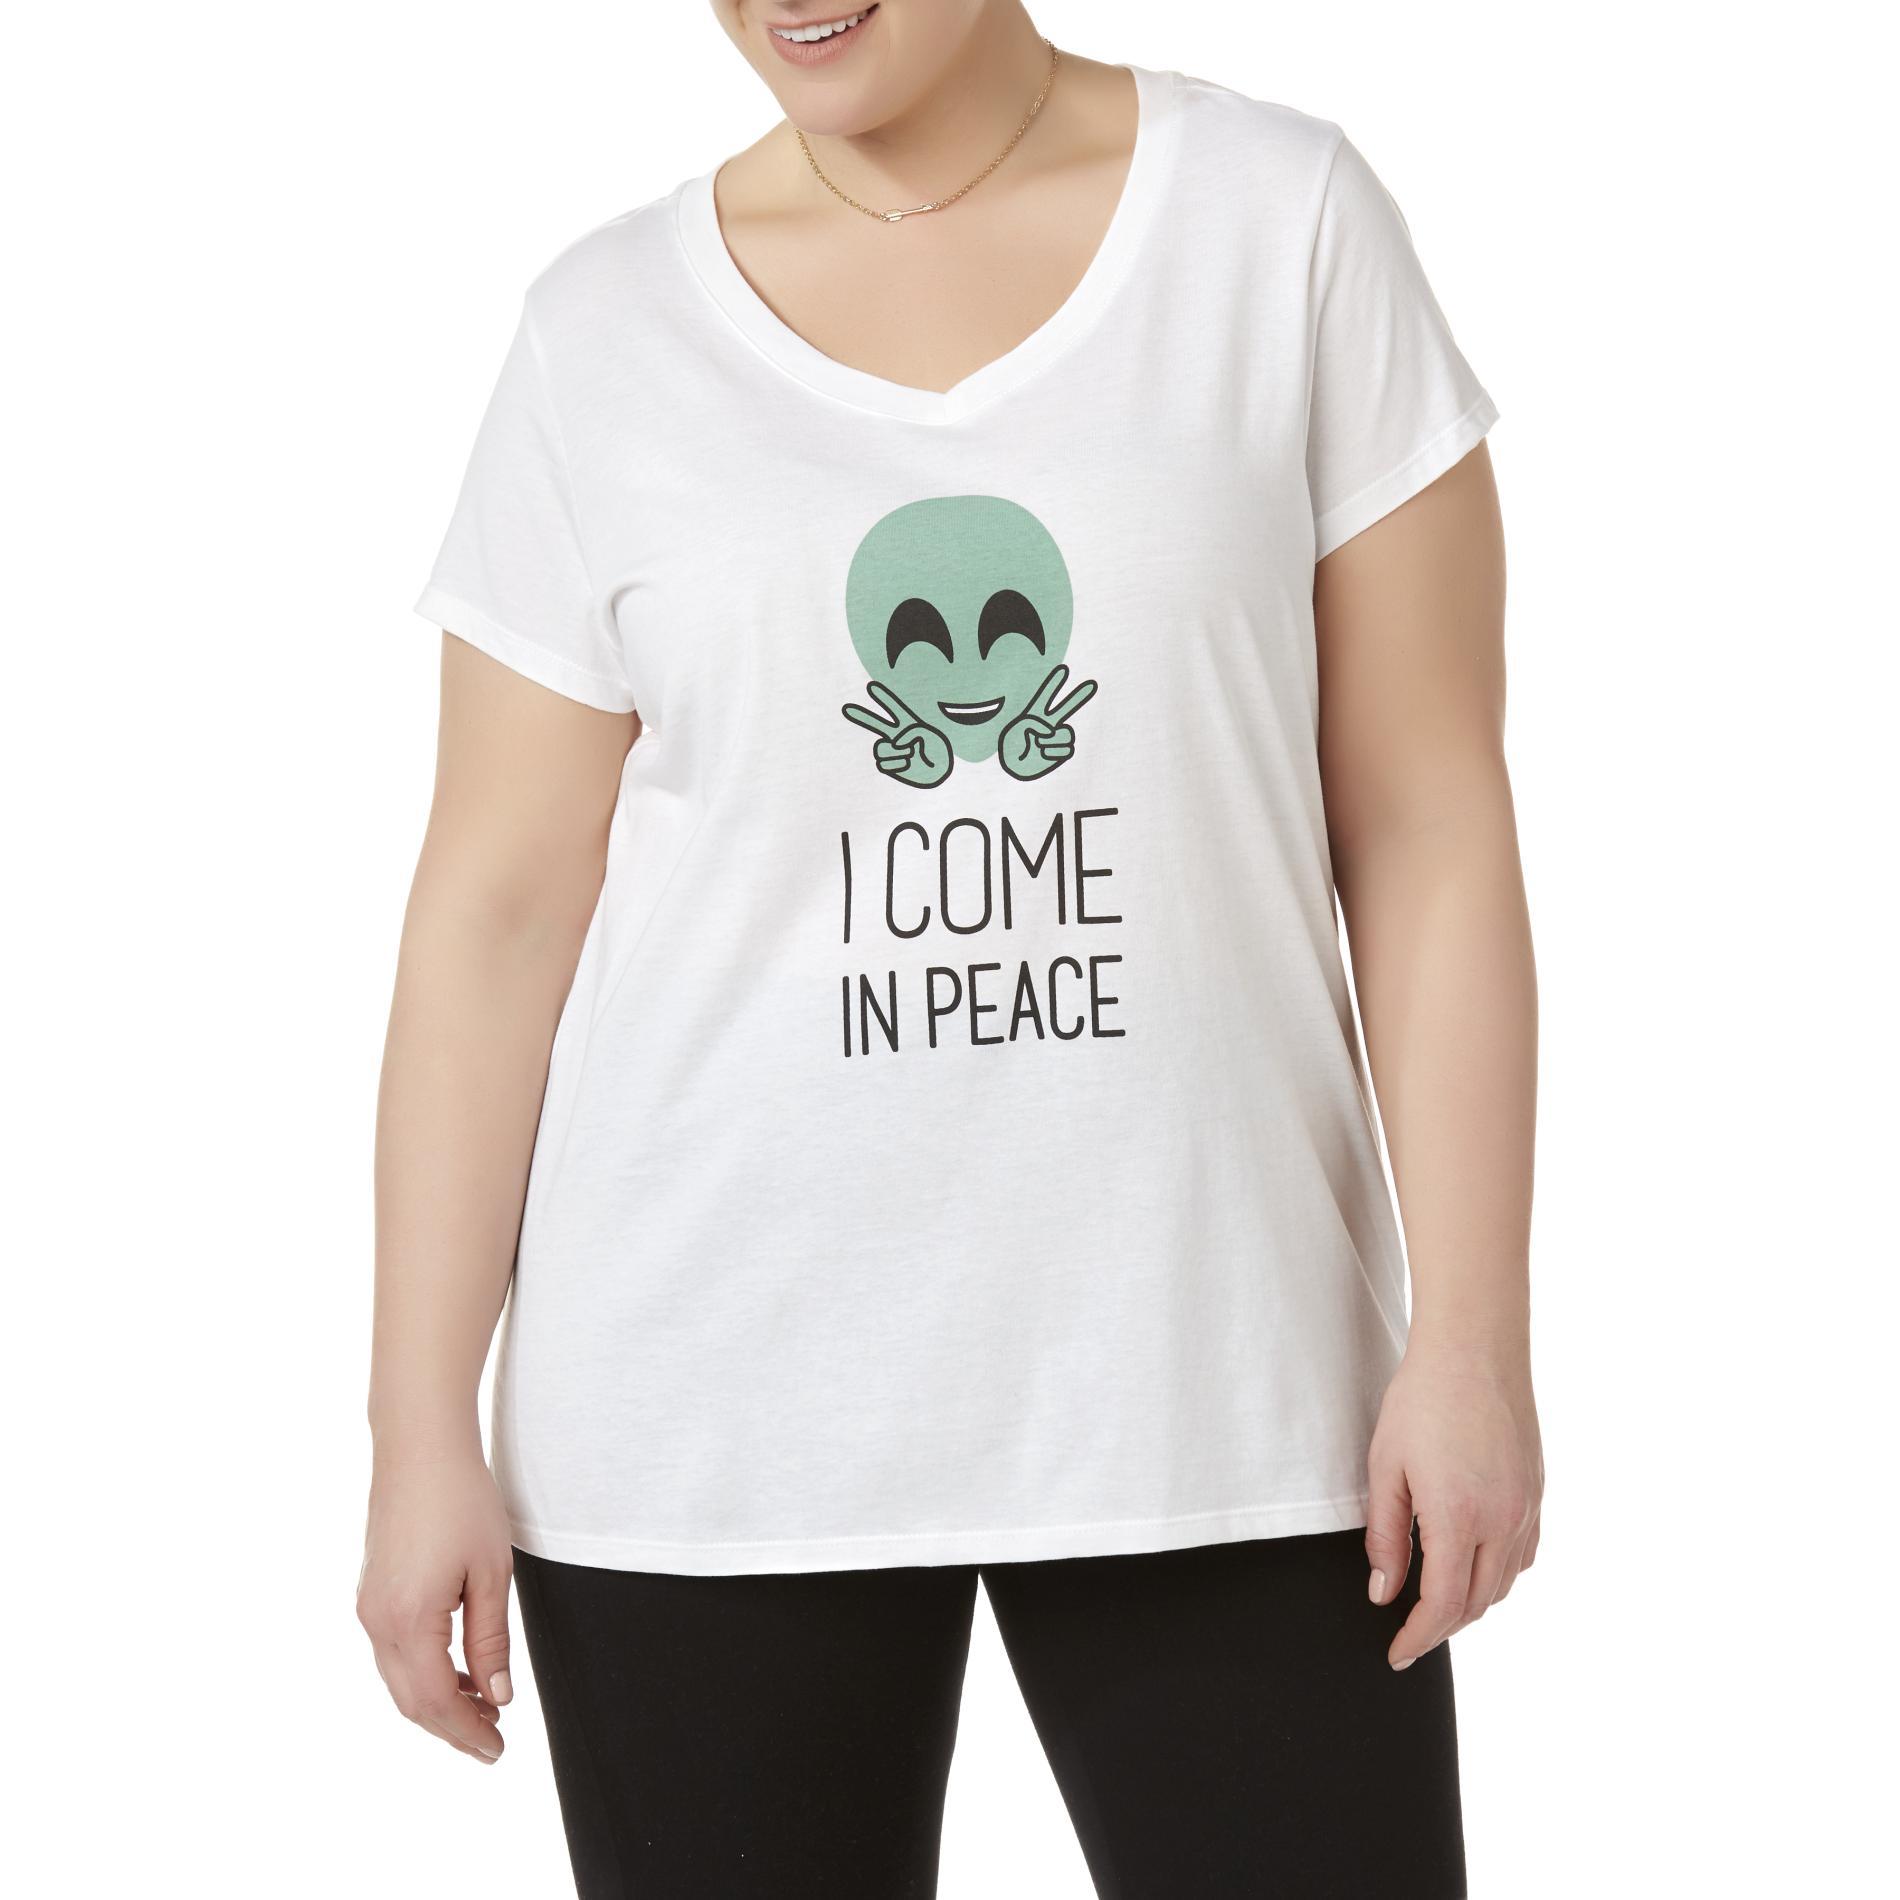 Joe Boxer Juniors' Plus V-Neck Graphic T-Shirt - I Come In Peace PartNumber: A020149406 MfgPartNumber: WC7JB78003PL